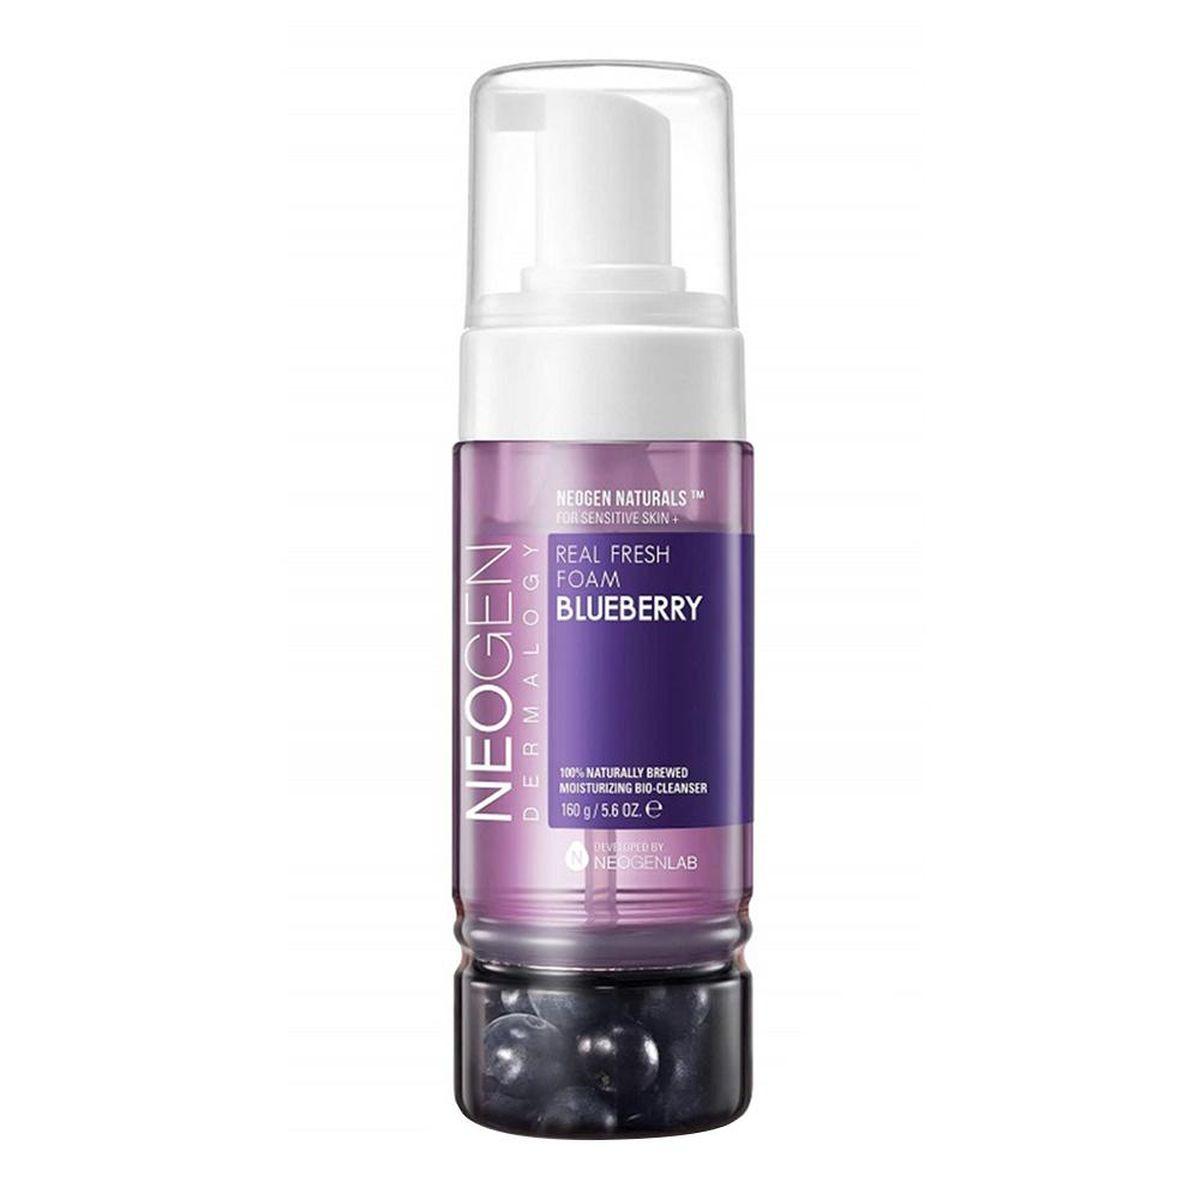 Увлажняющая пенка для умывания с черникой Neogen Dermalogy Real Fresh Foam Cleanser Blueberry - 160 гр